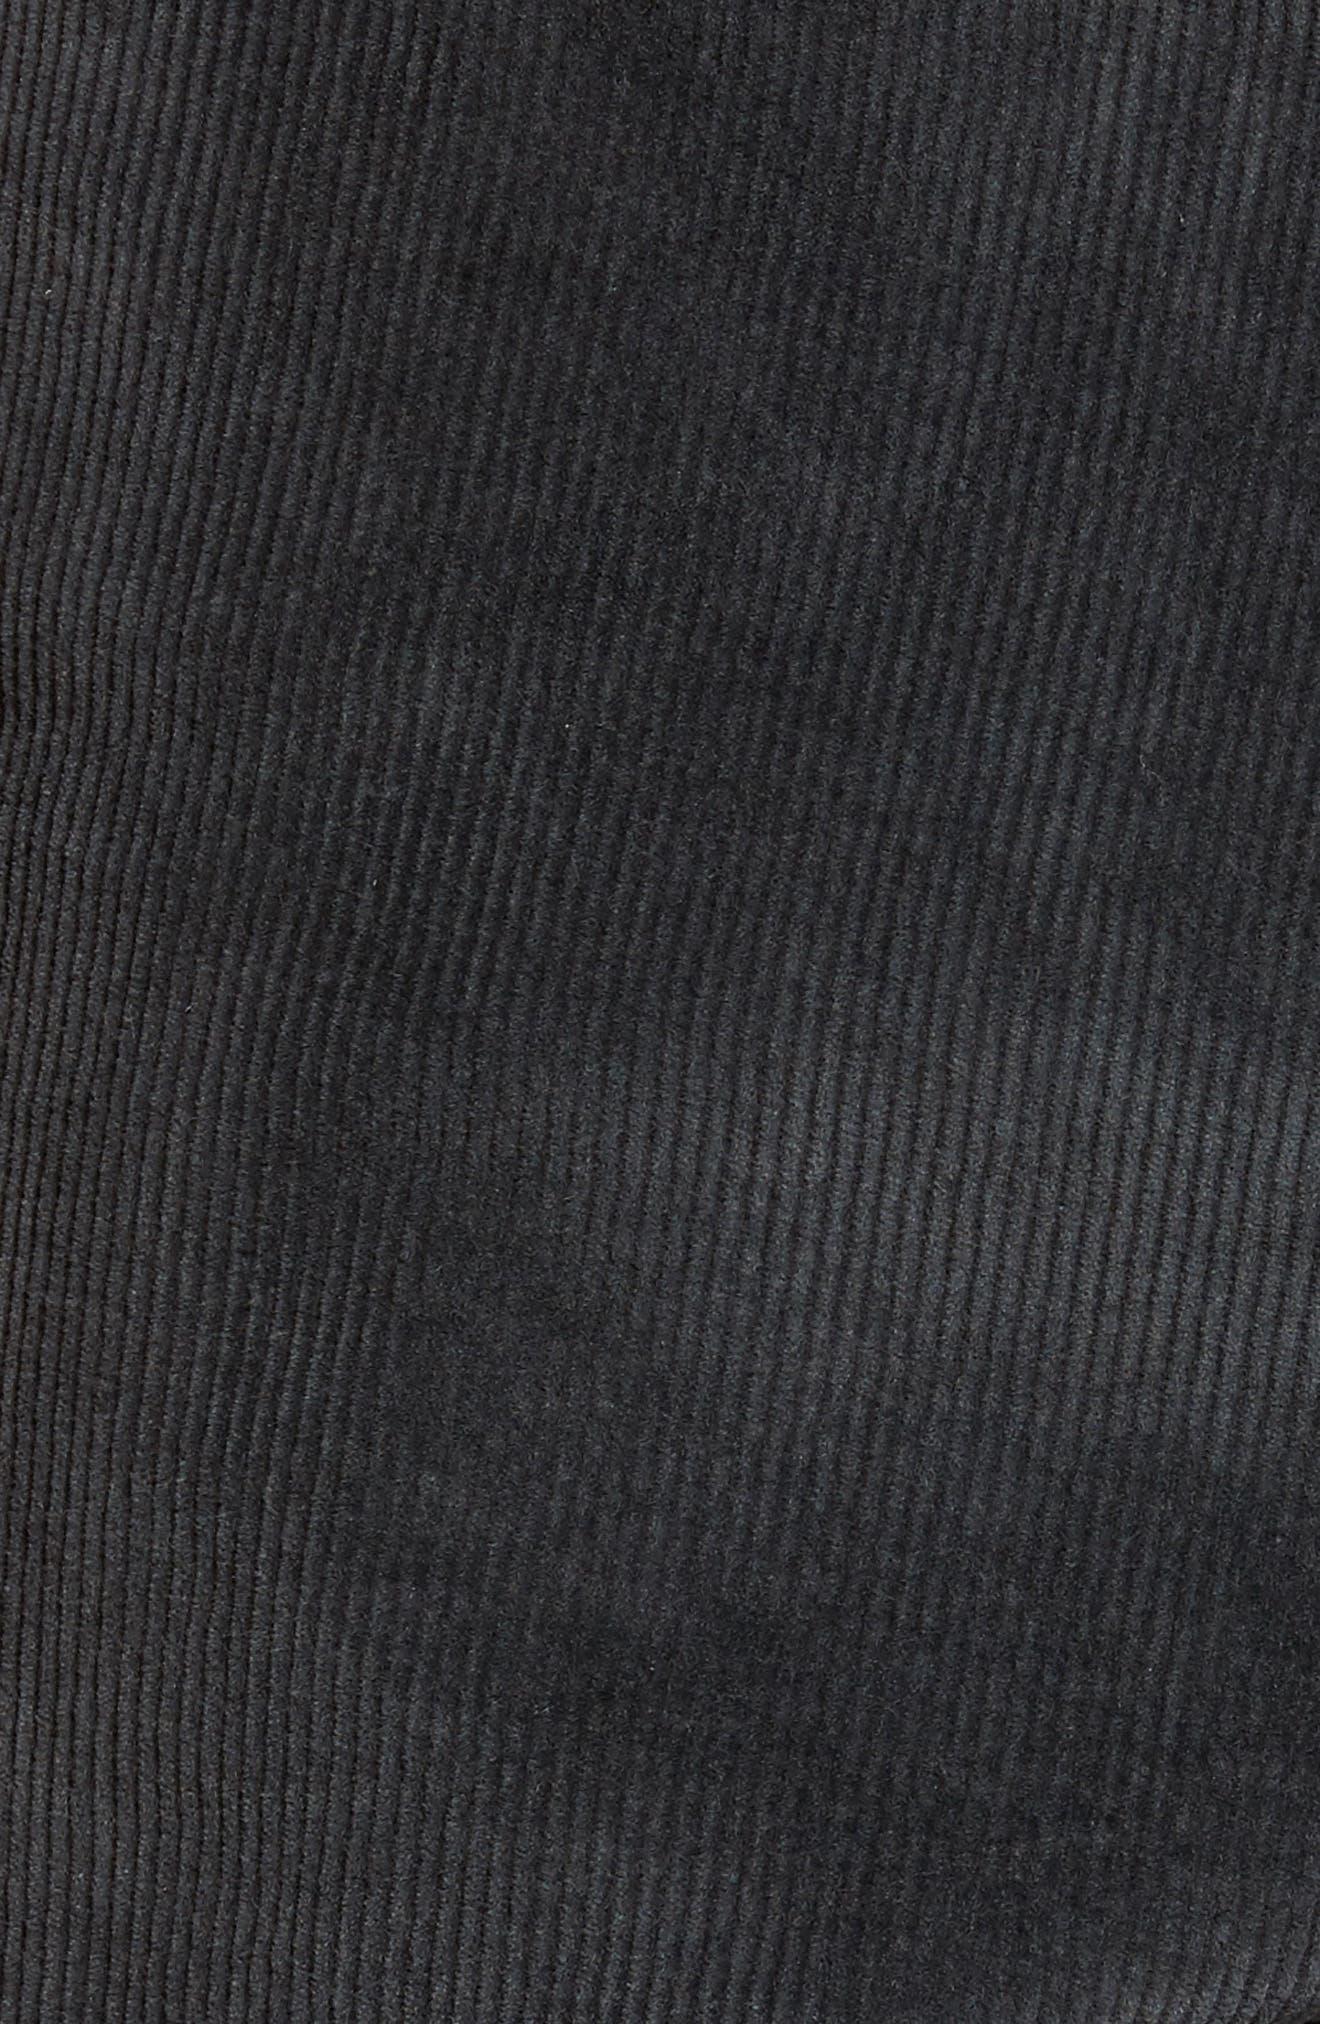 Outsider Corduroy Shorts,                             Alternate thumbnail 5, color,                             010